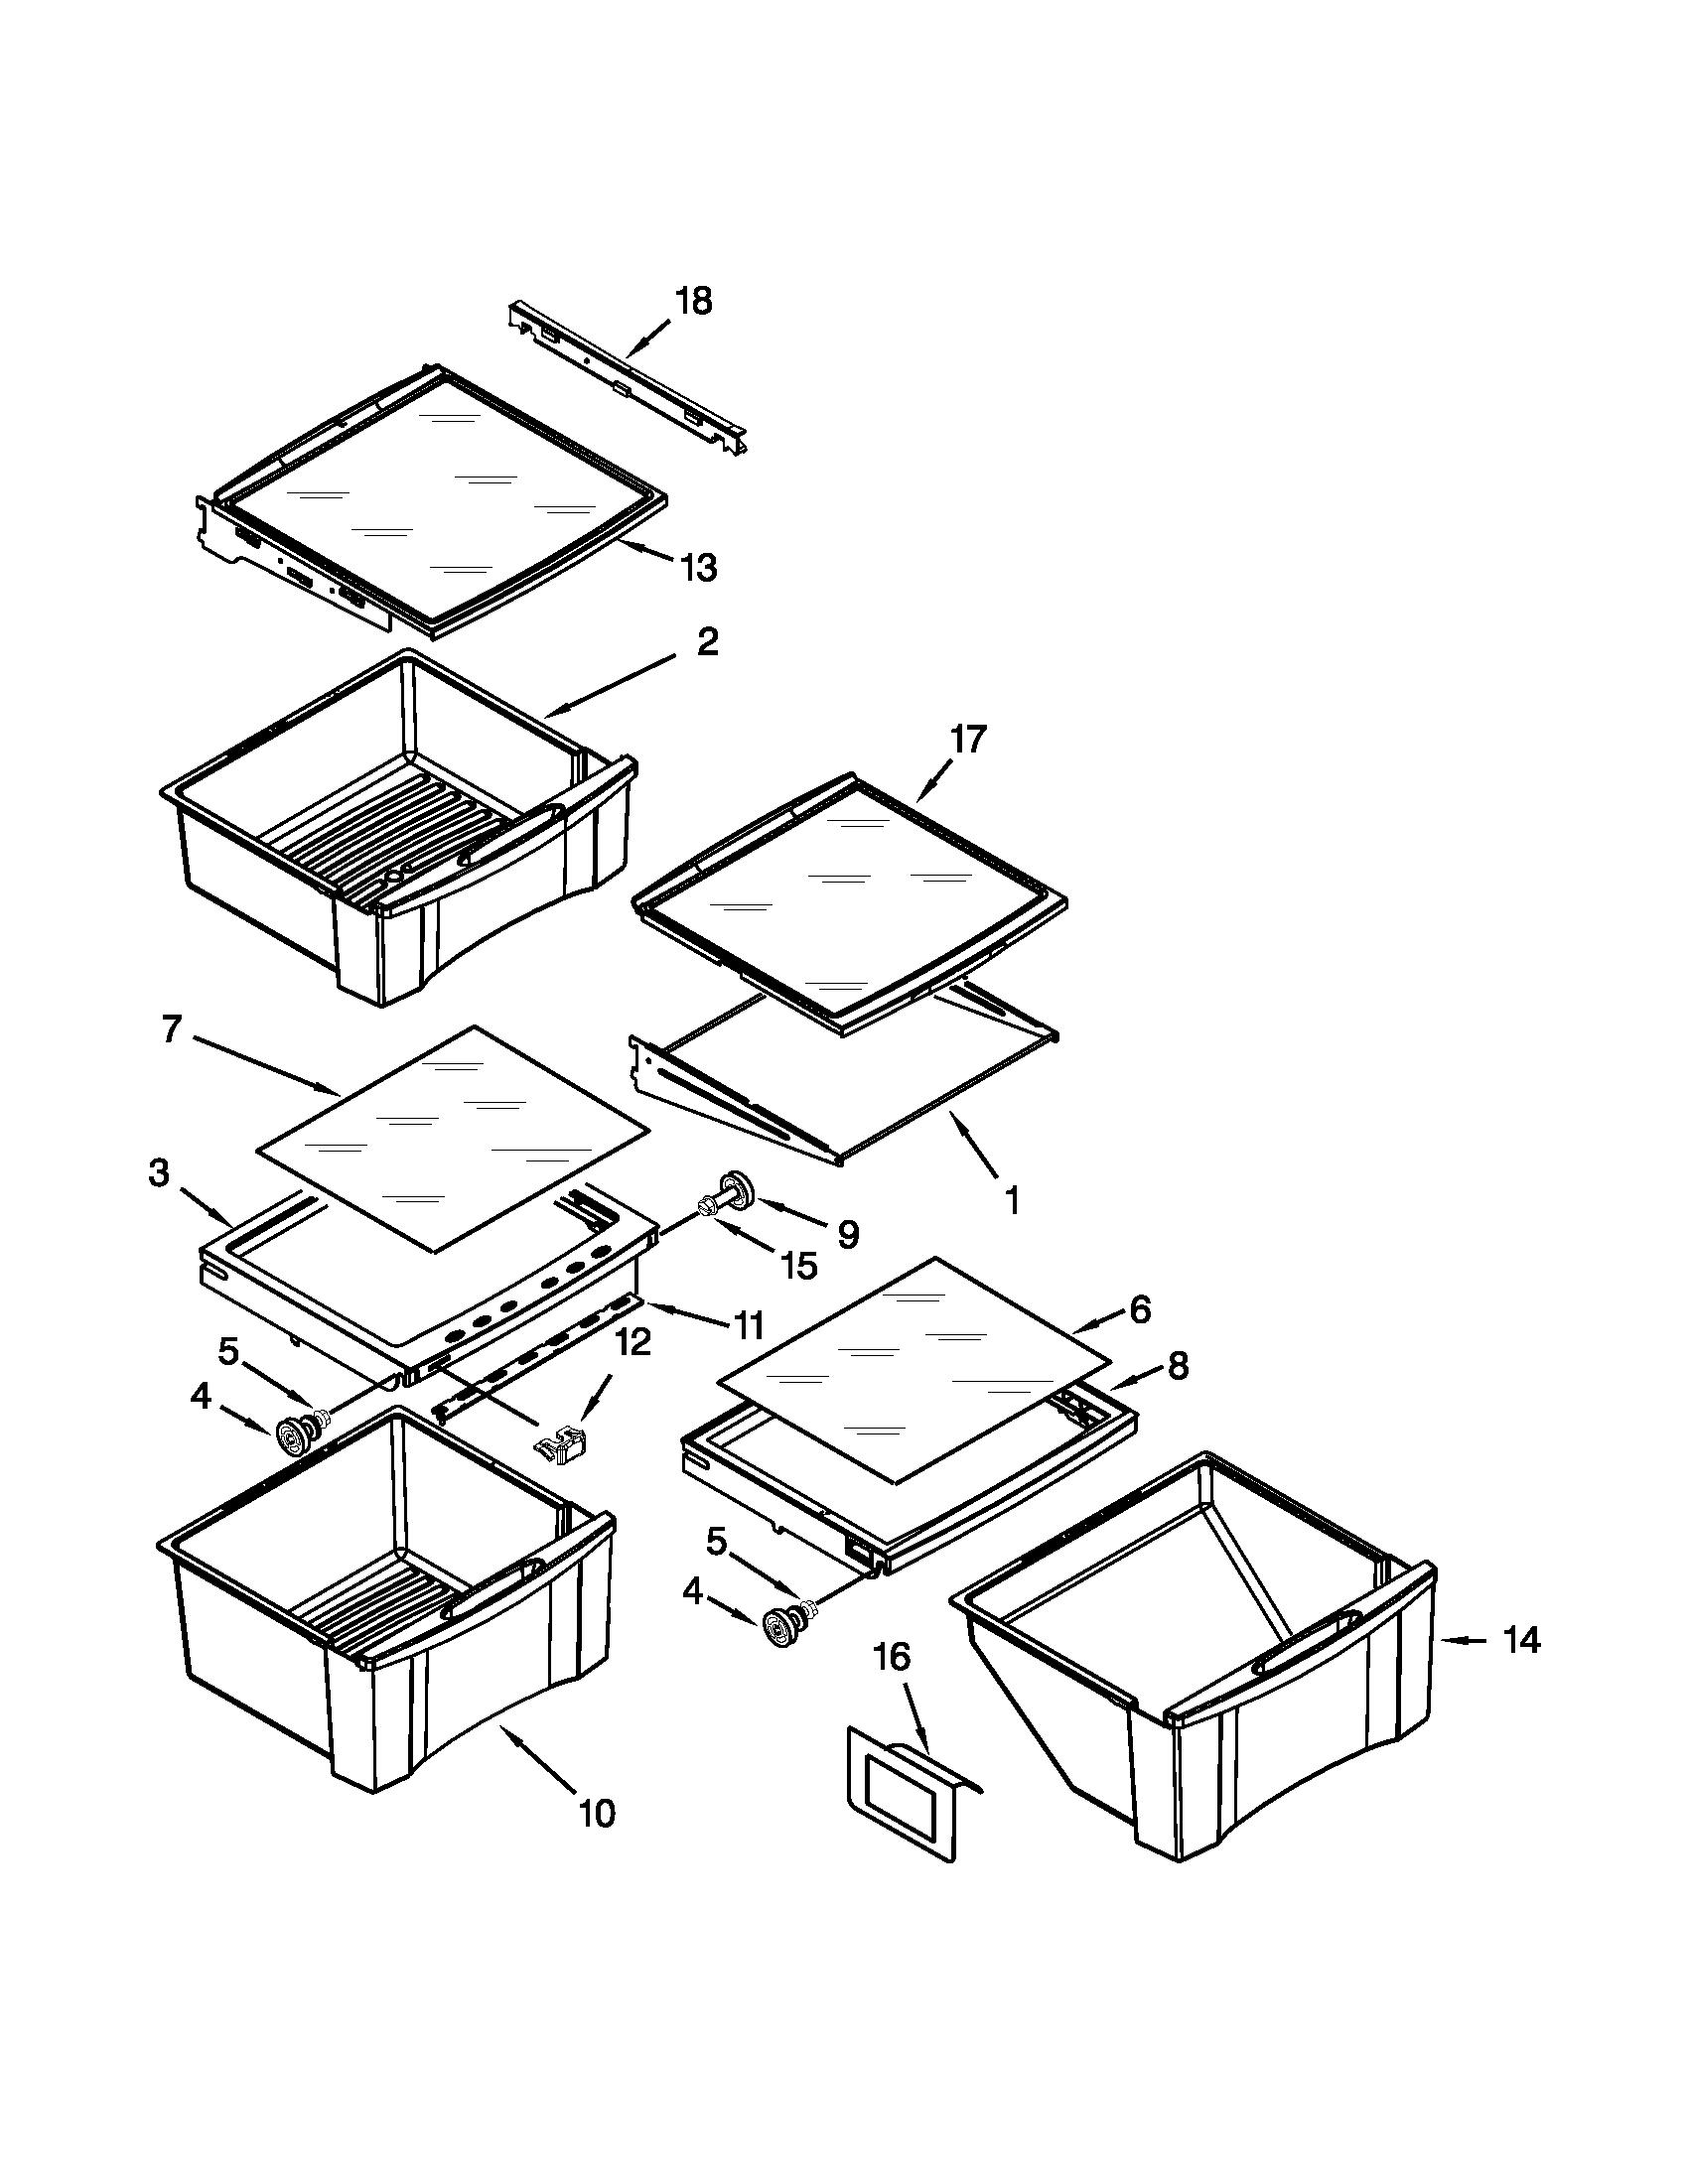 Whirlpool model GD5RVAXVY01 side-by-side refrigerator